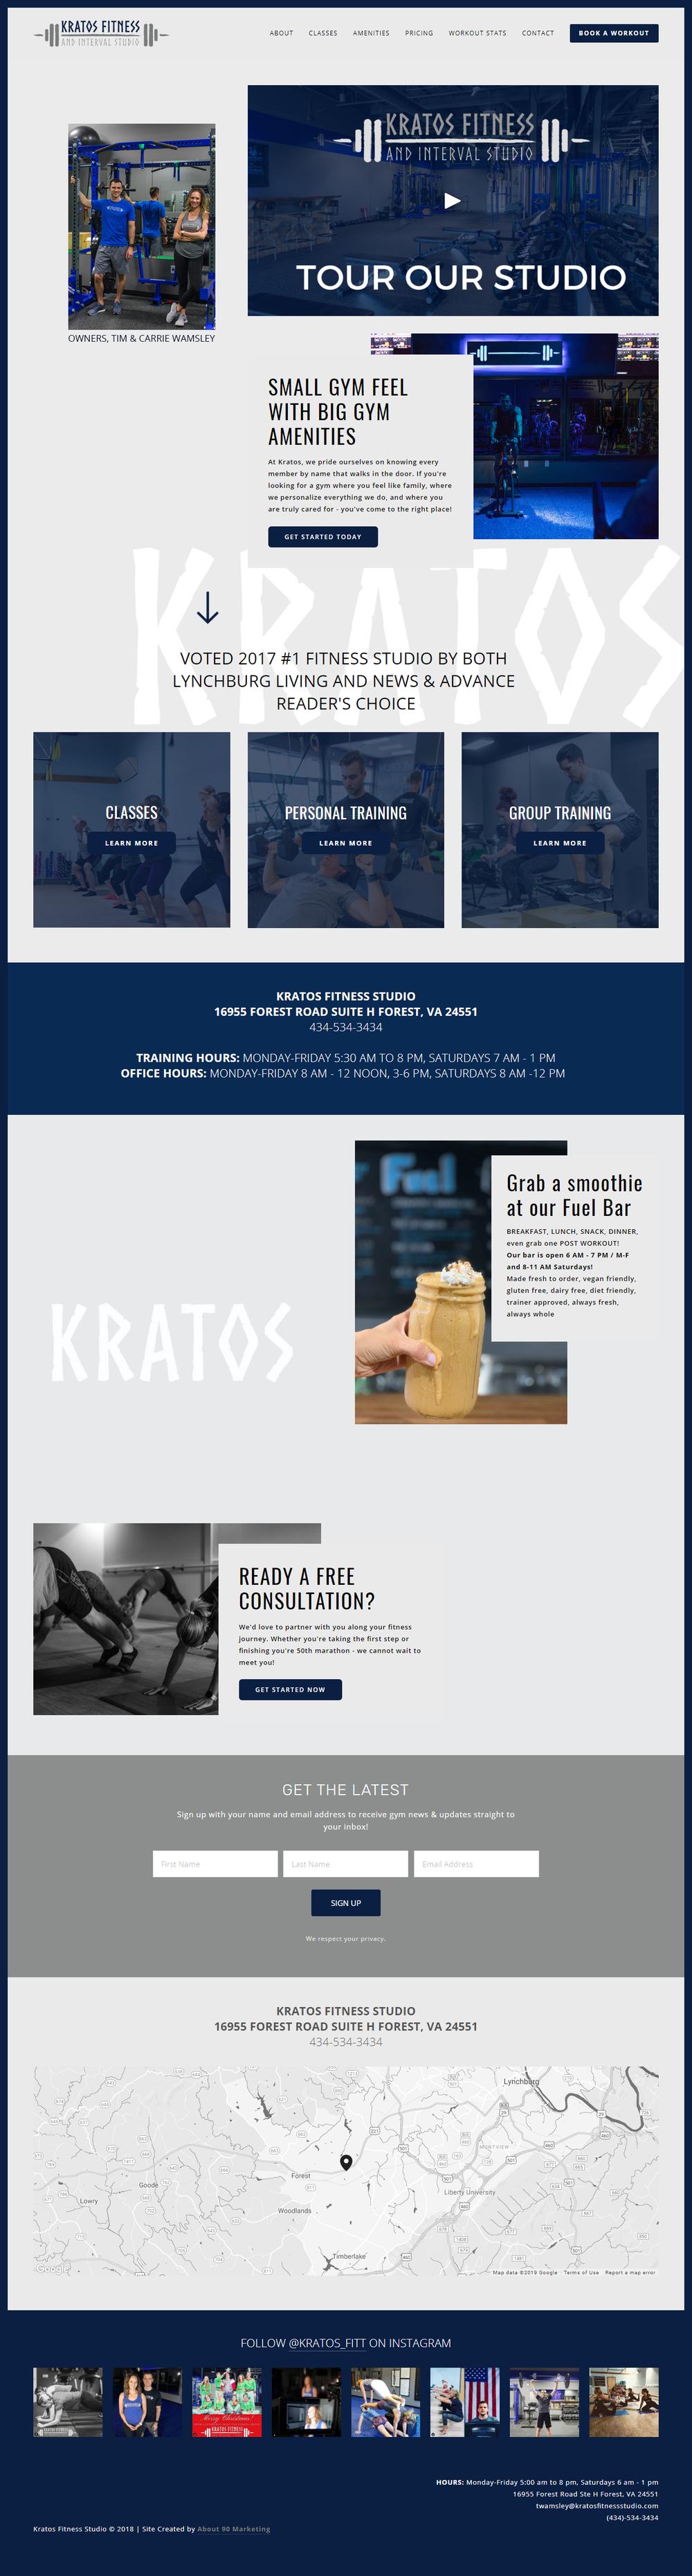 2019-01-13-11-24-www.kratosfitnessstudio.com.png